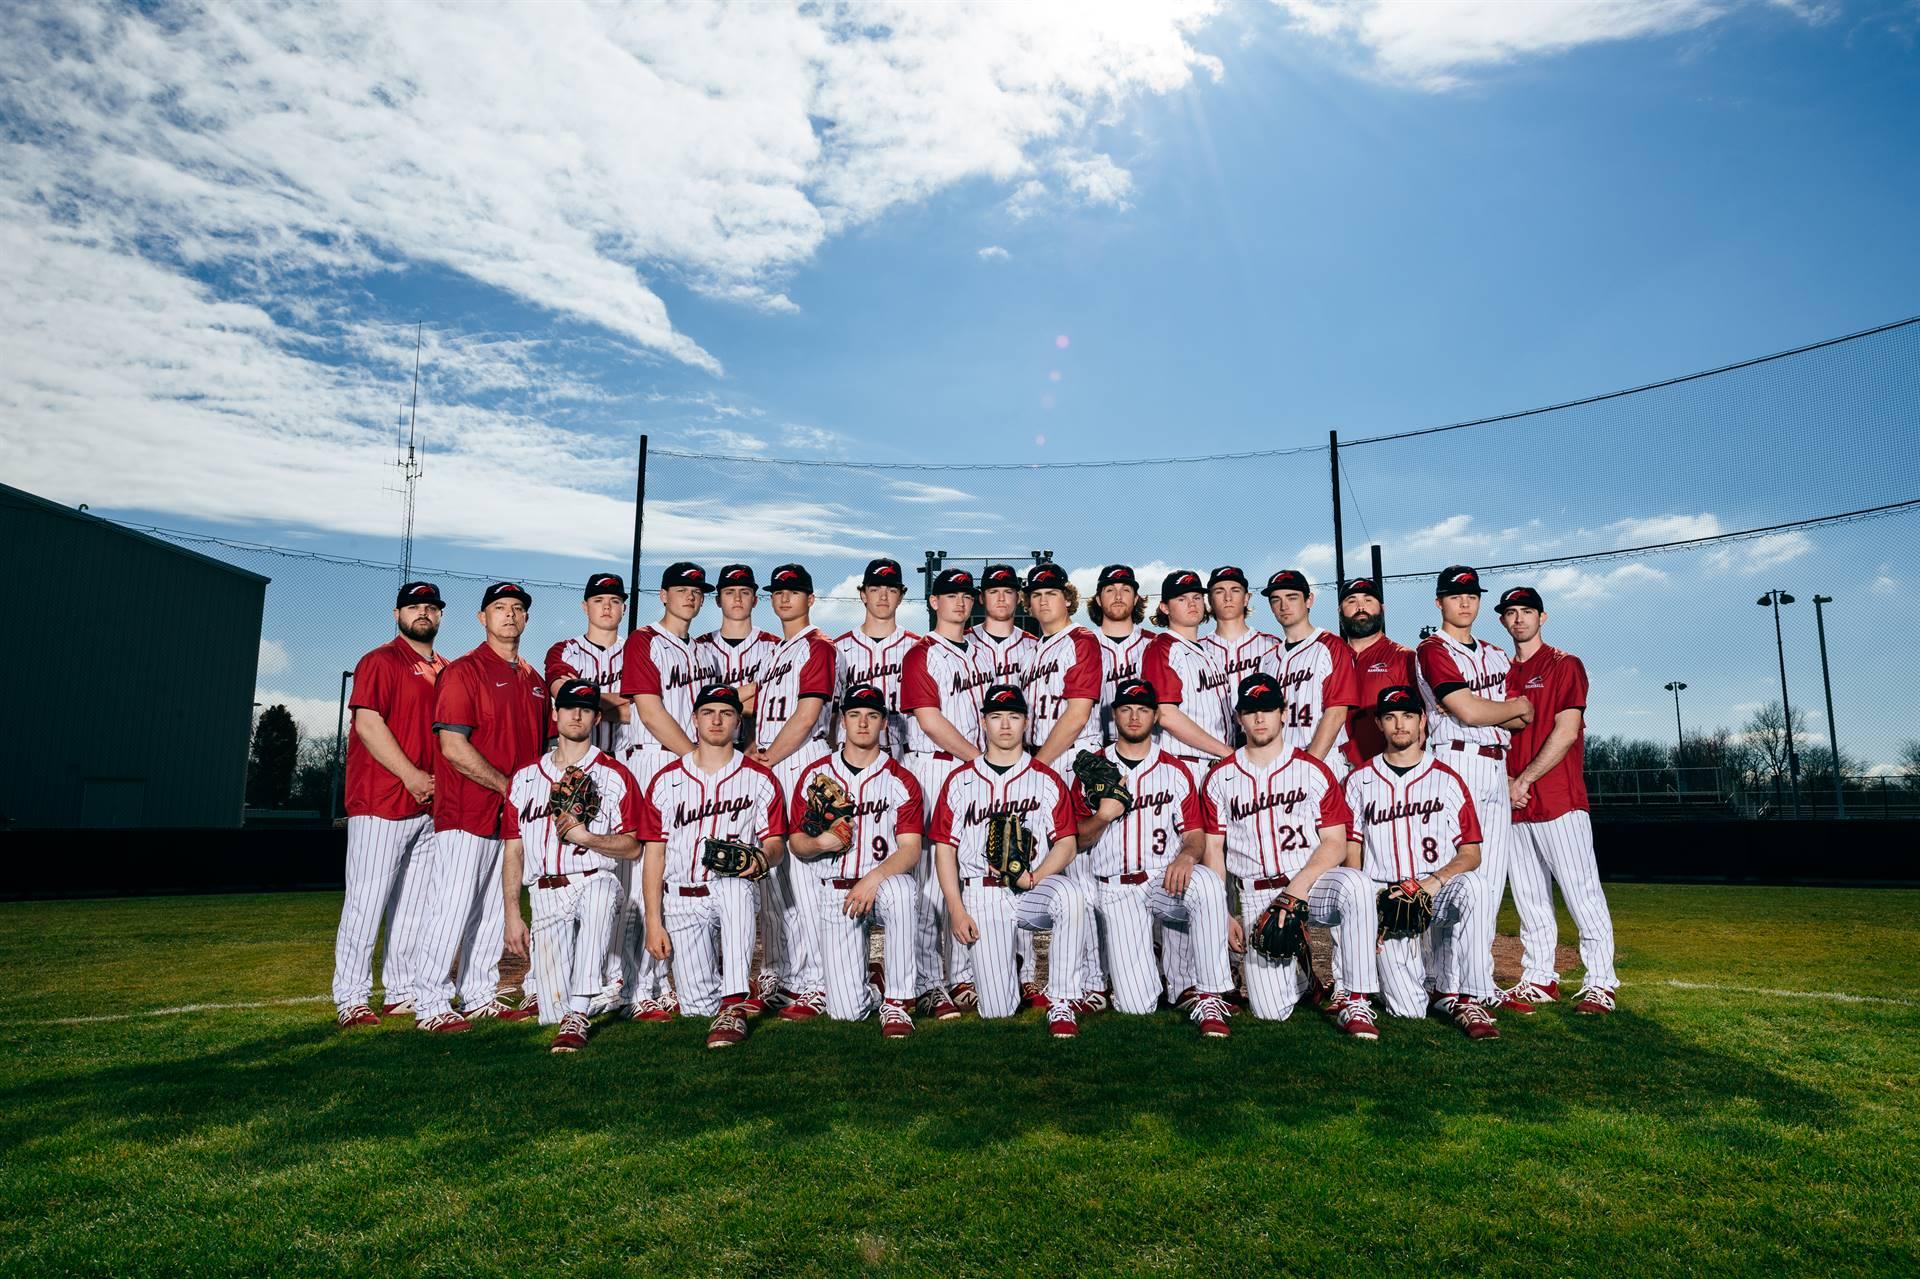 Mustangs Varsity Baseball 2019-20